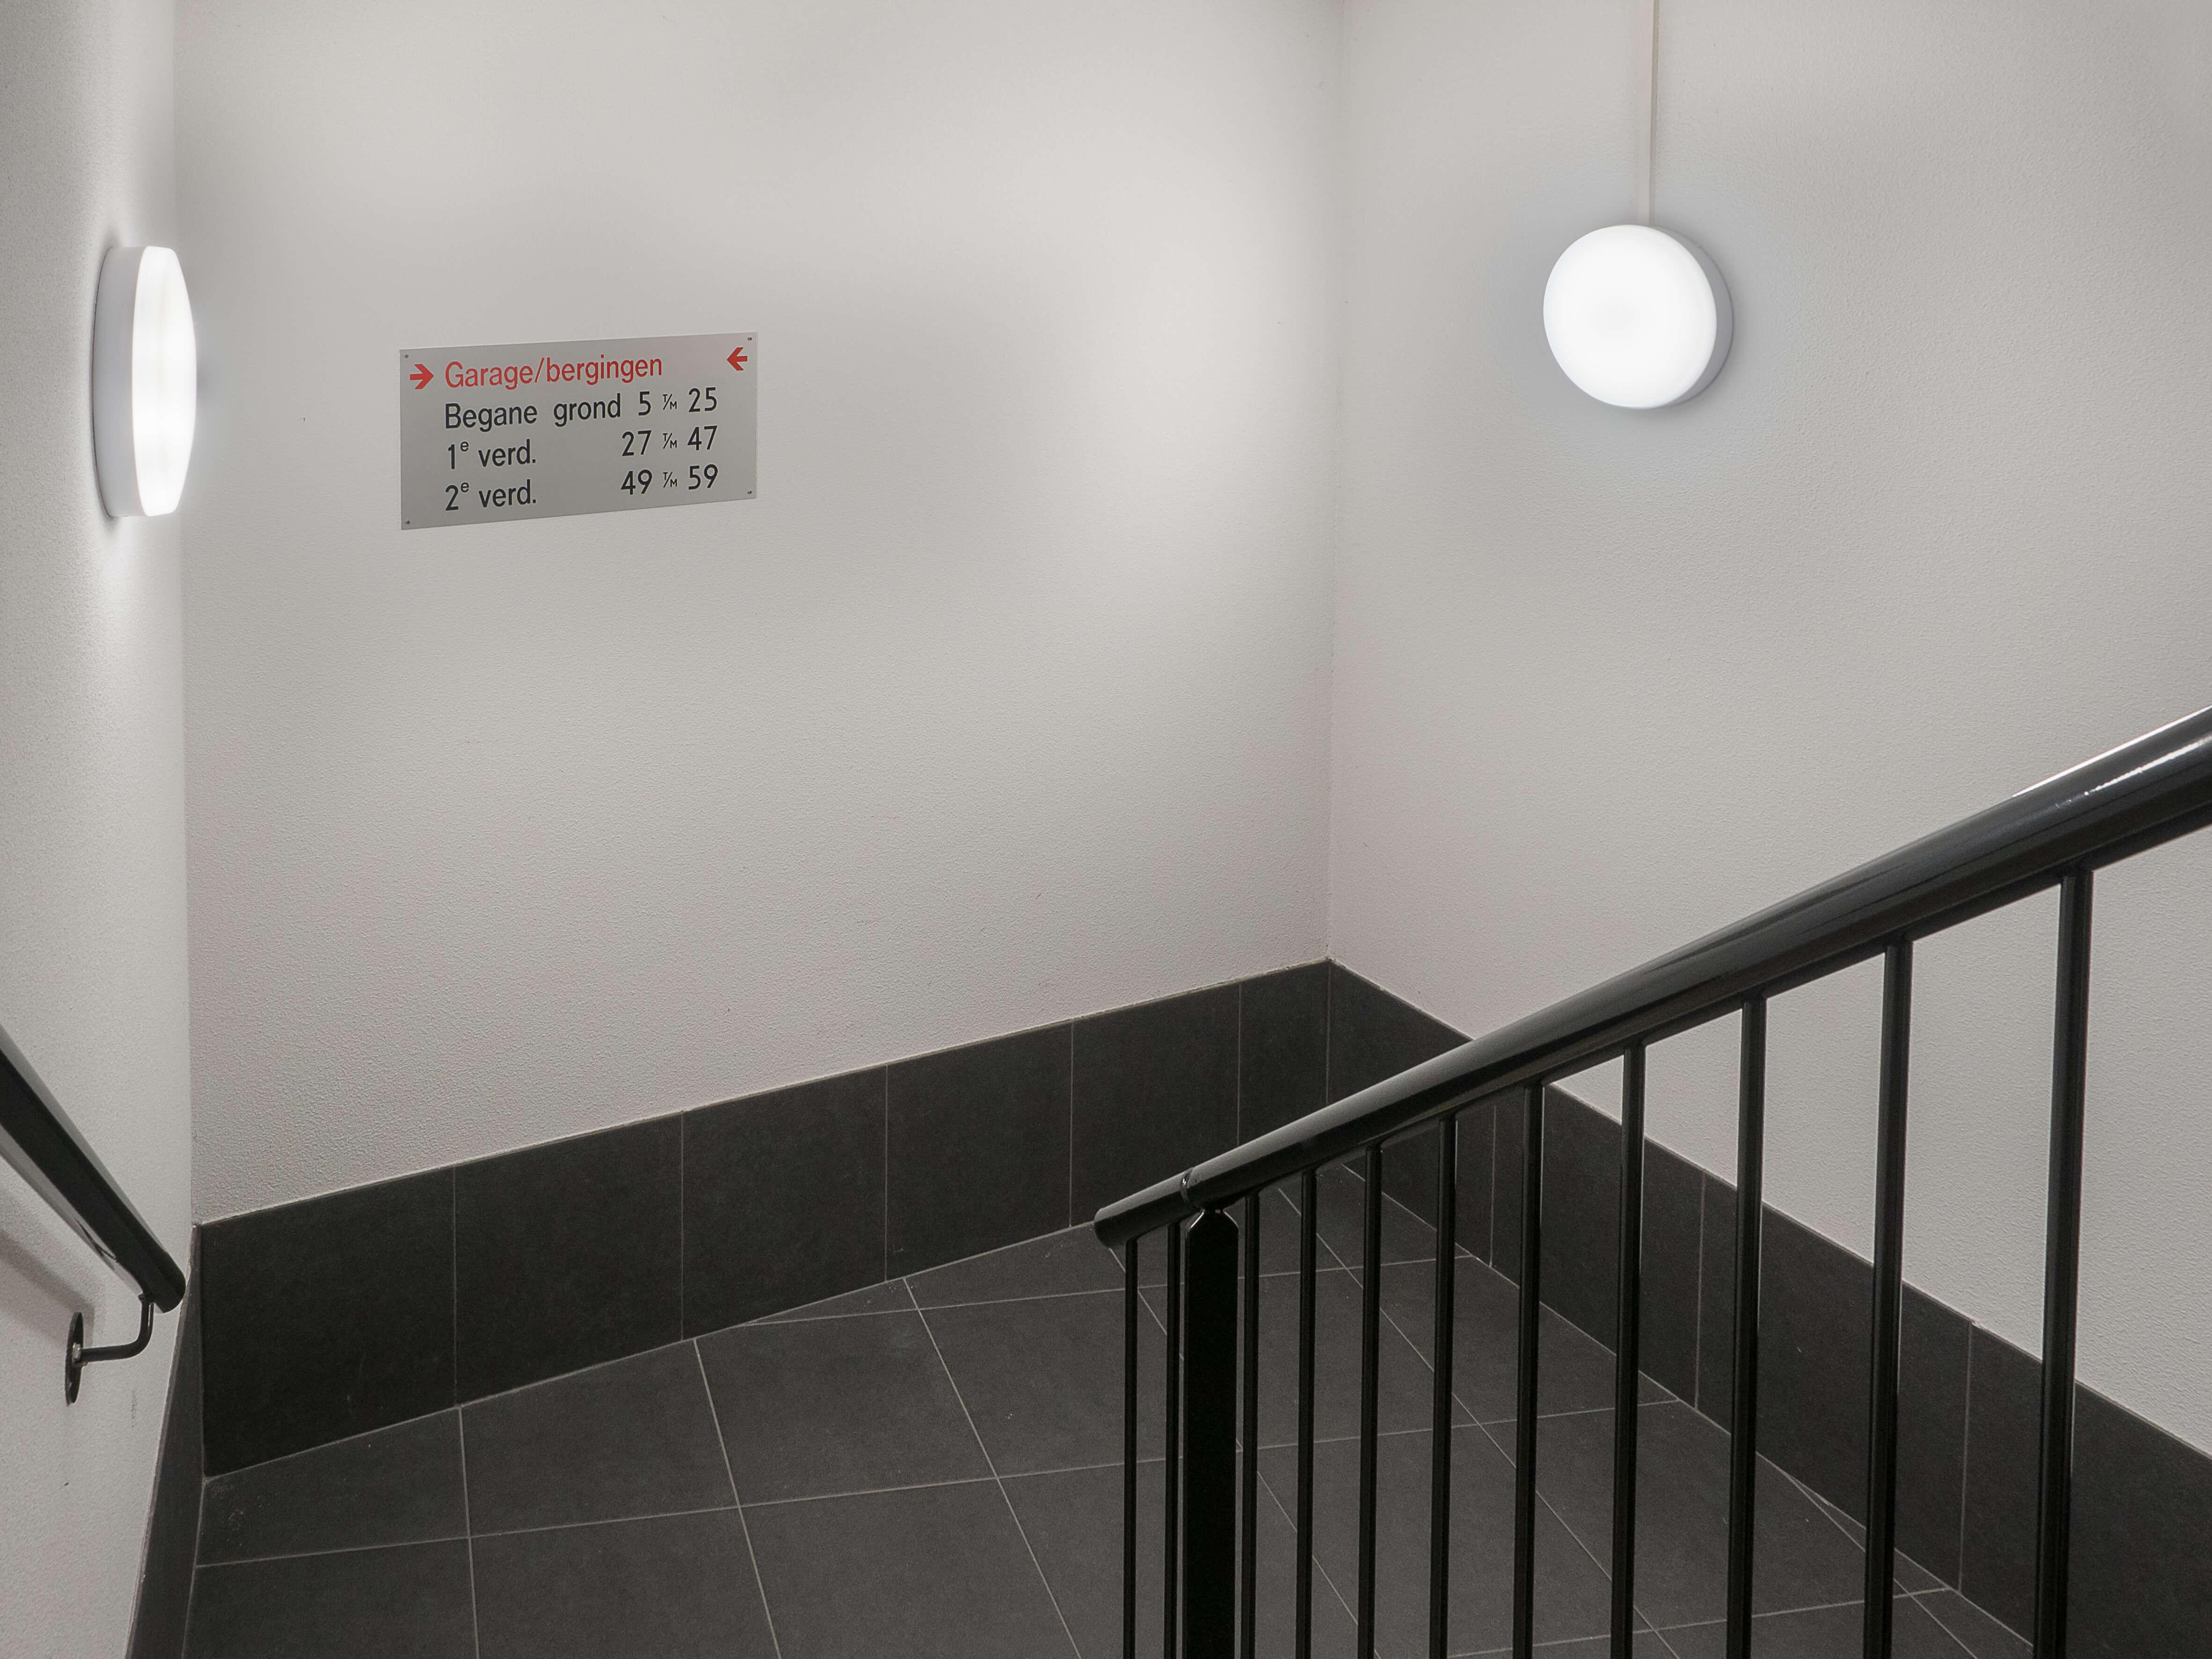 https://www.ib-steutel.nl/wp-content/uploads/2017/12/Rollandthof-LED-verlichting-parkeergarage-04.jpg